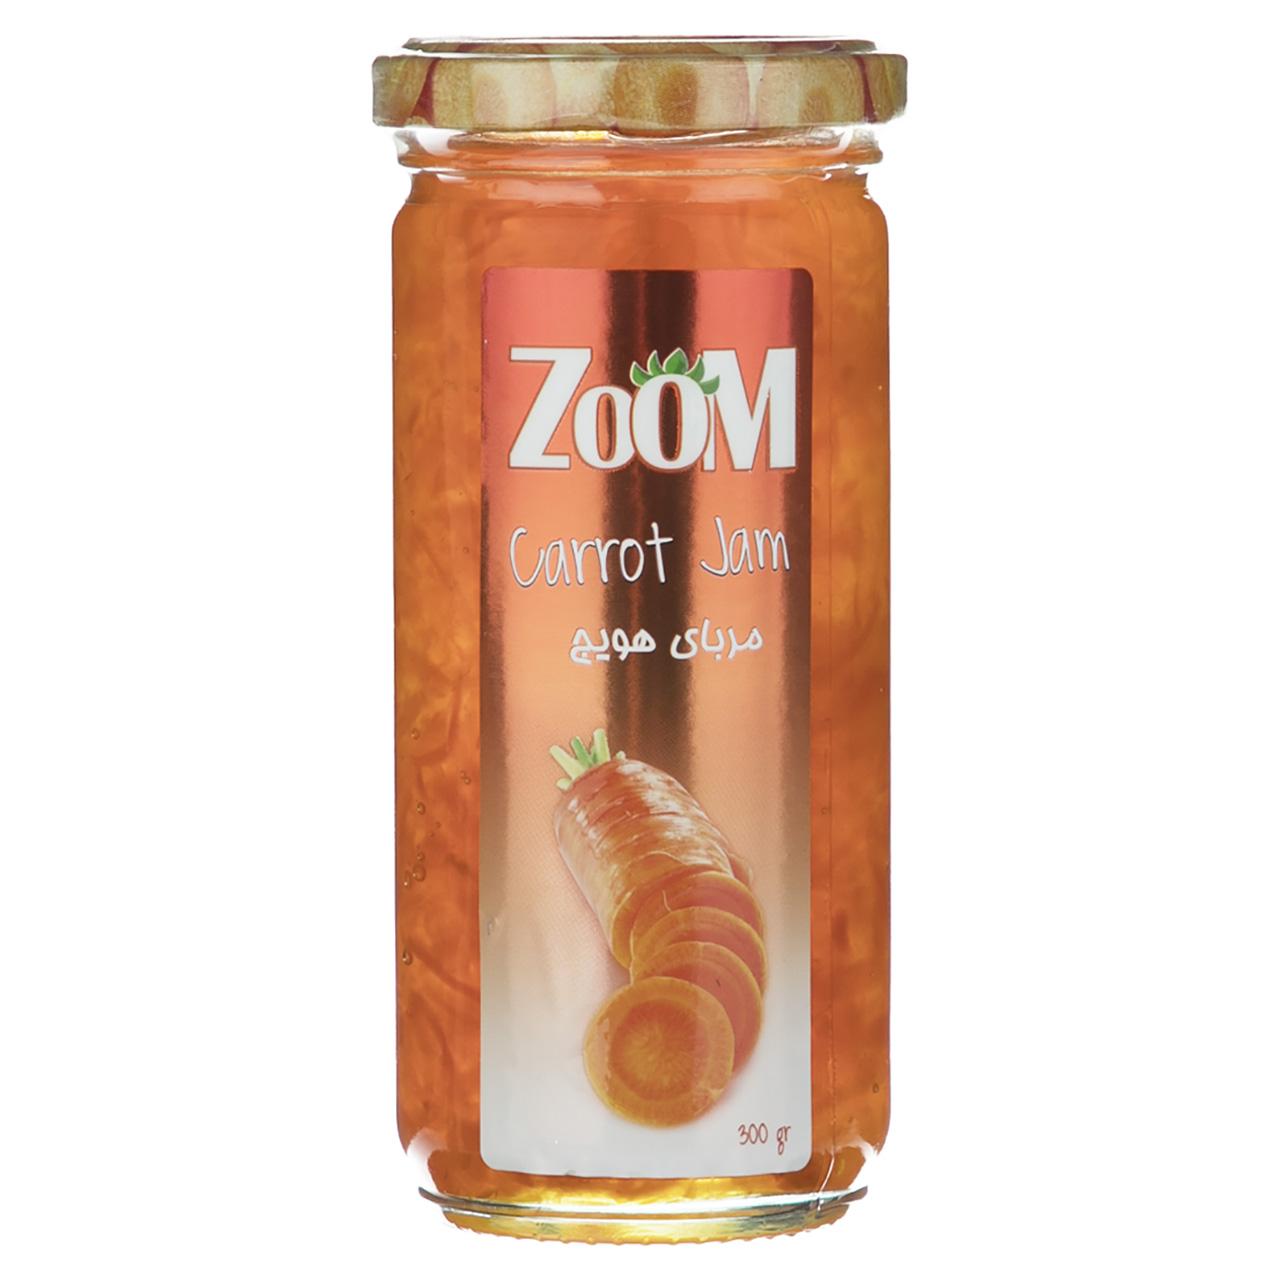 مربا هویج زوم - 300 گرم